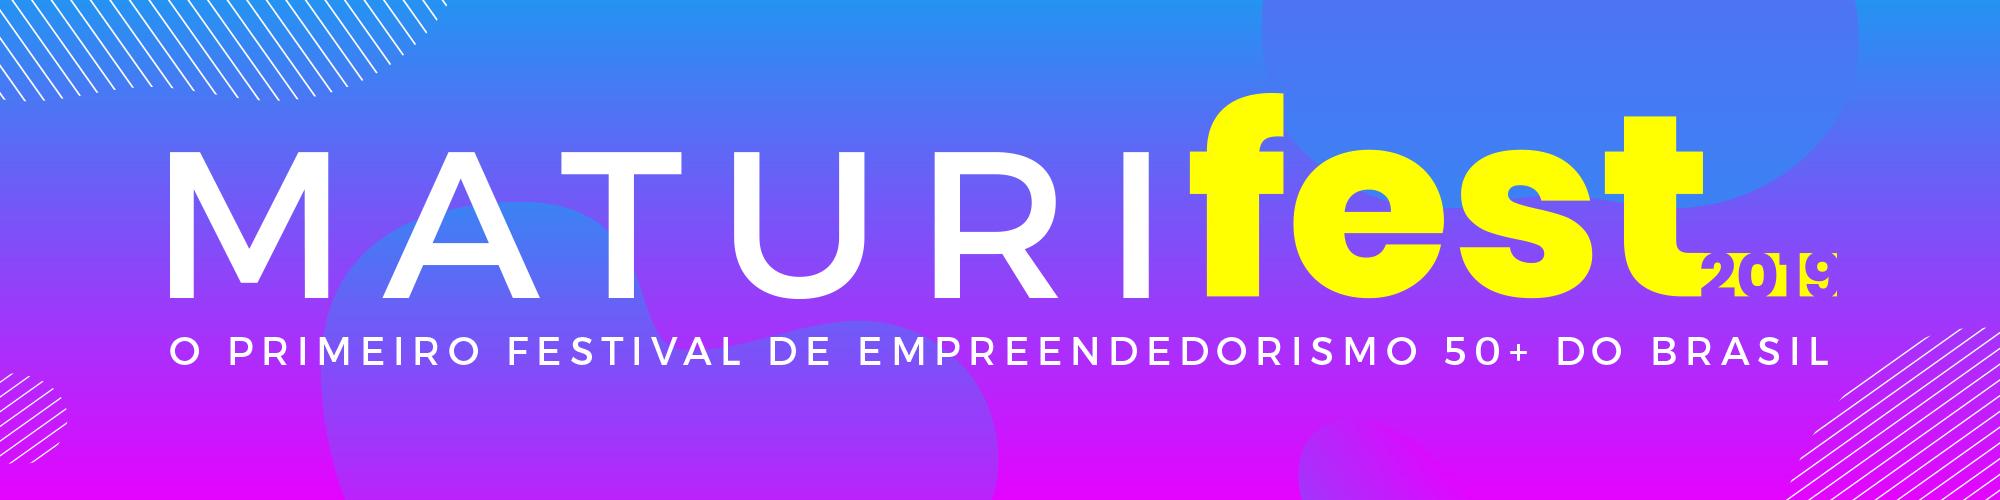 "Unibes Cultural recebe ""MaturiFest"", 1º festival de empreendedorismo 50+ do Brasil"